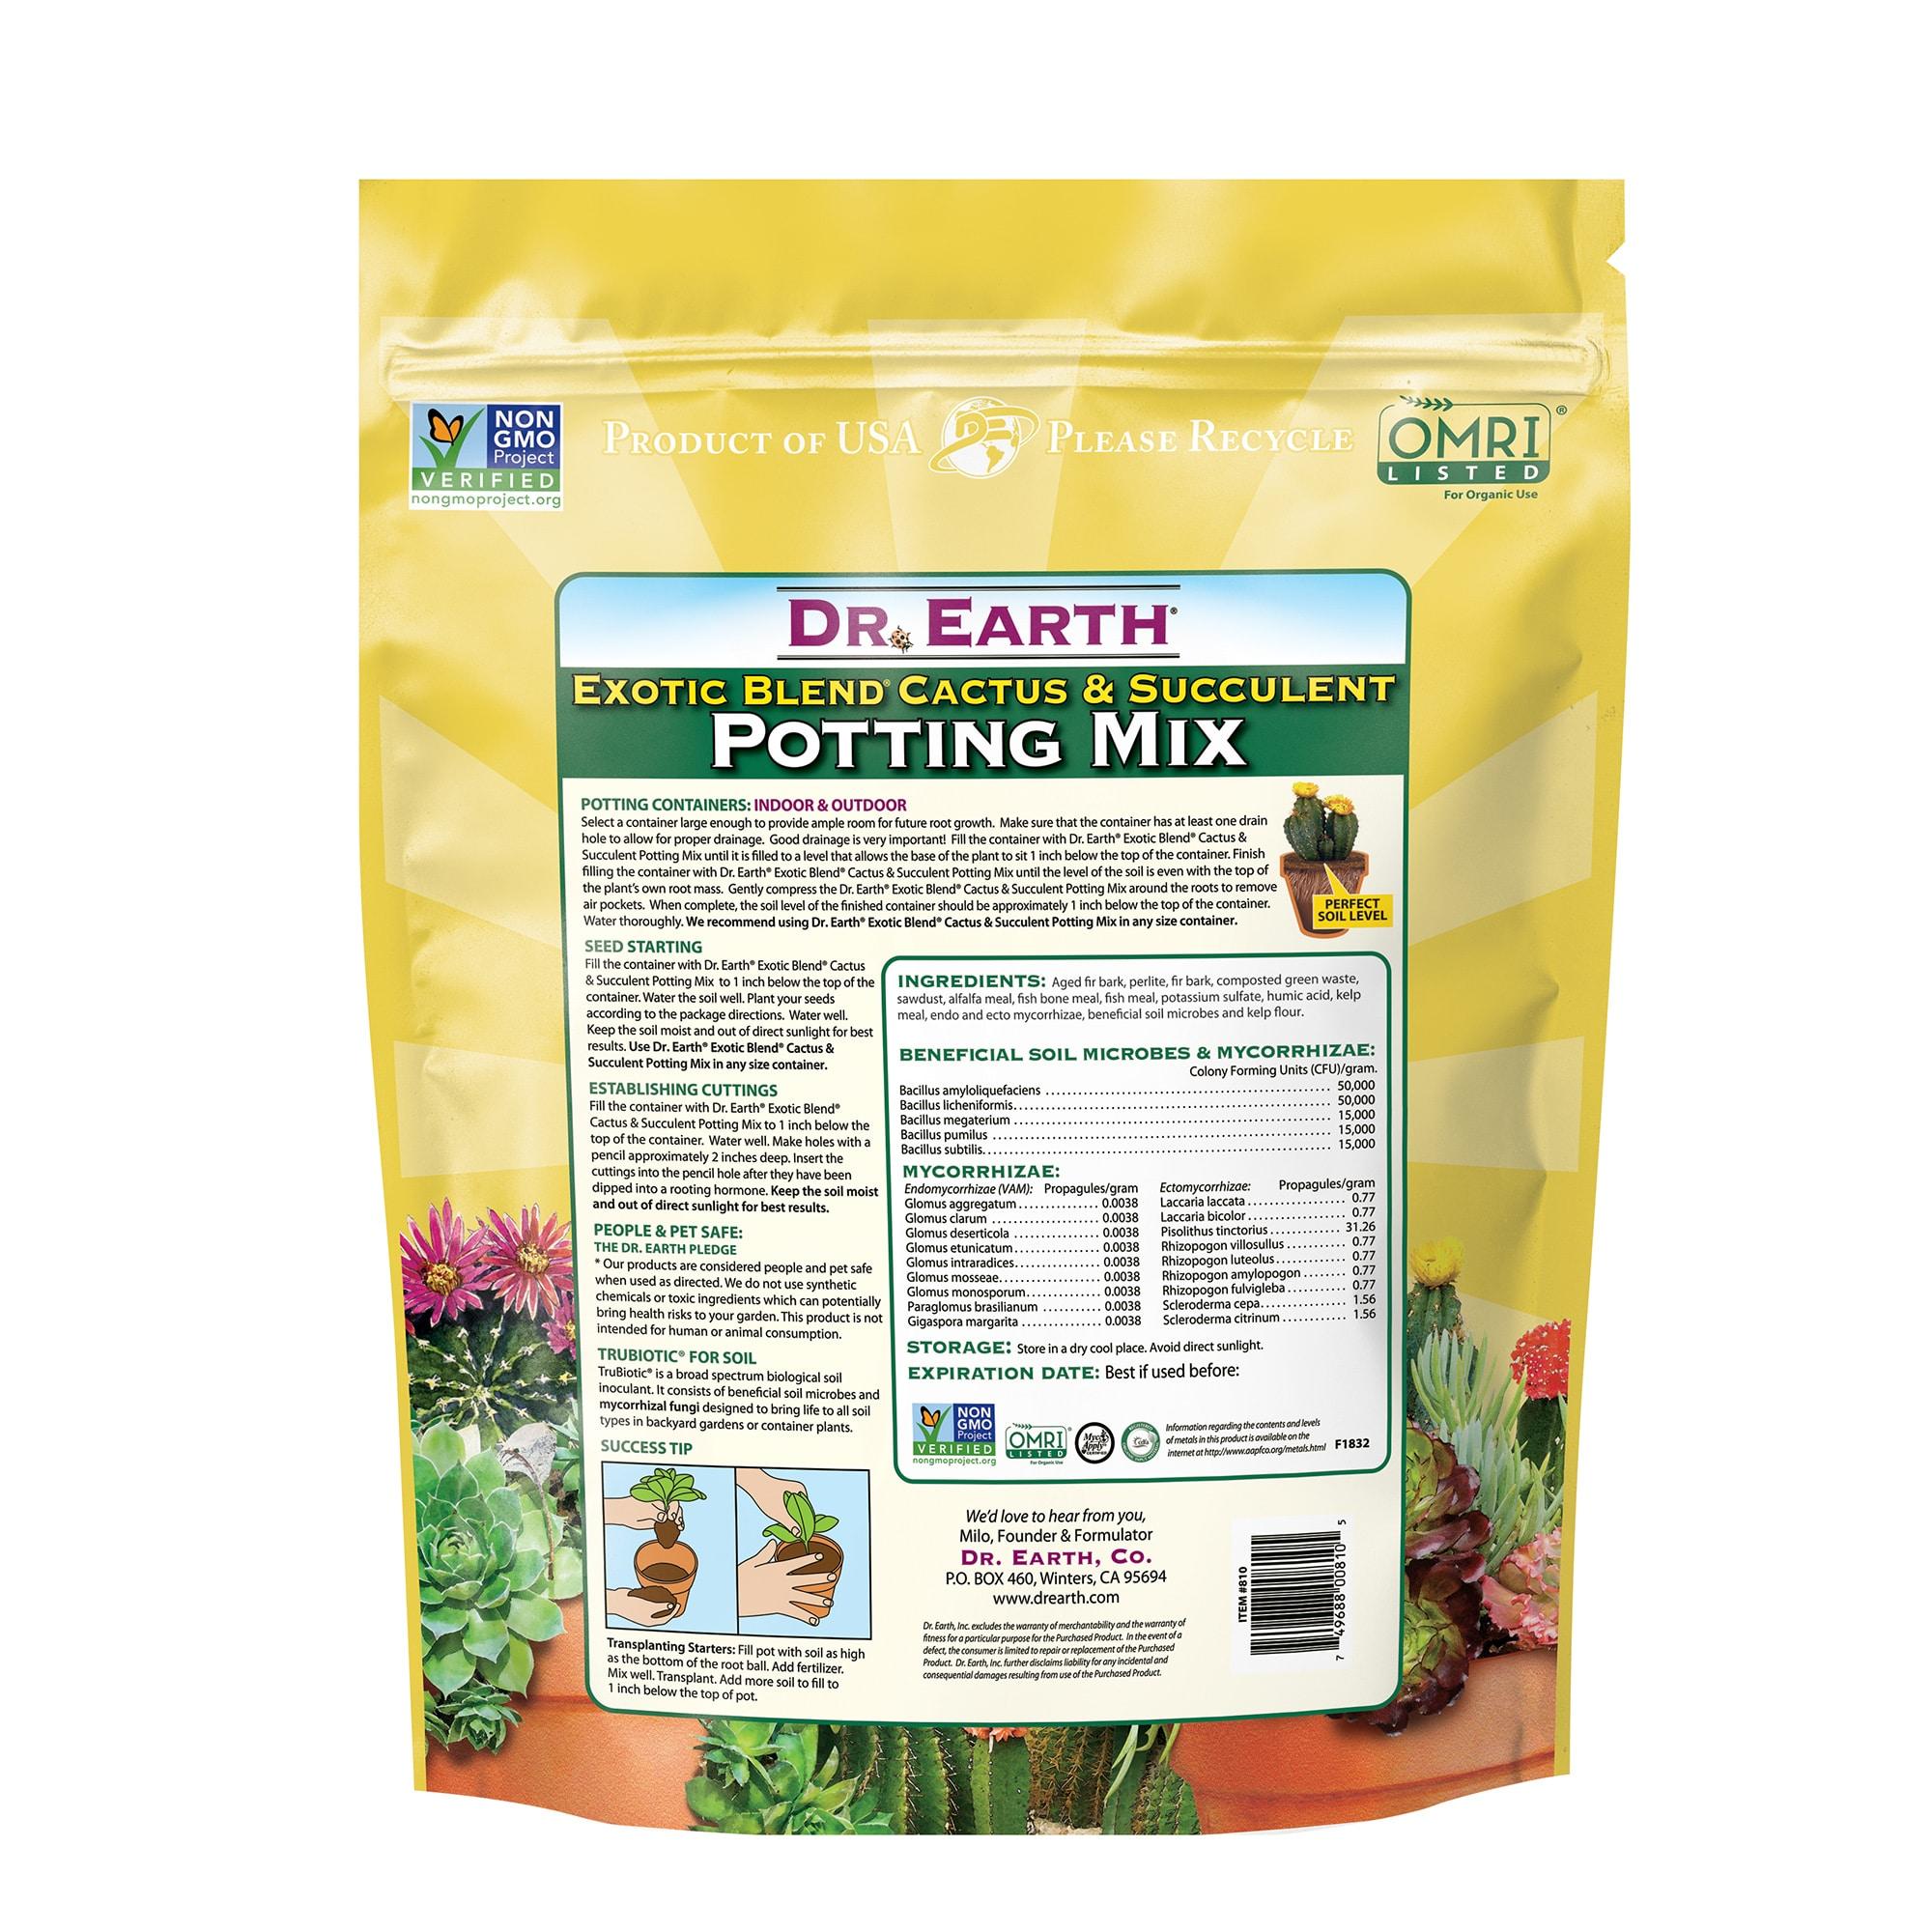 Exotic Blend Cactus & Succulent Potting Mix